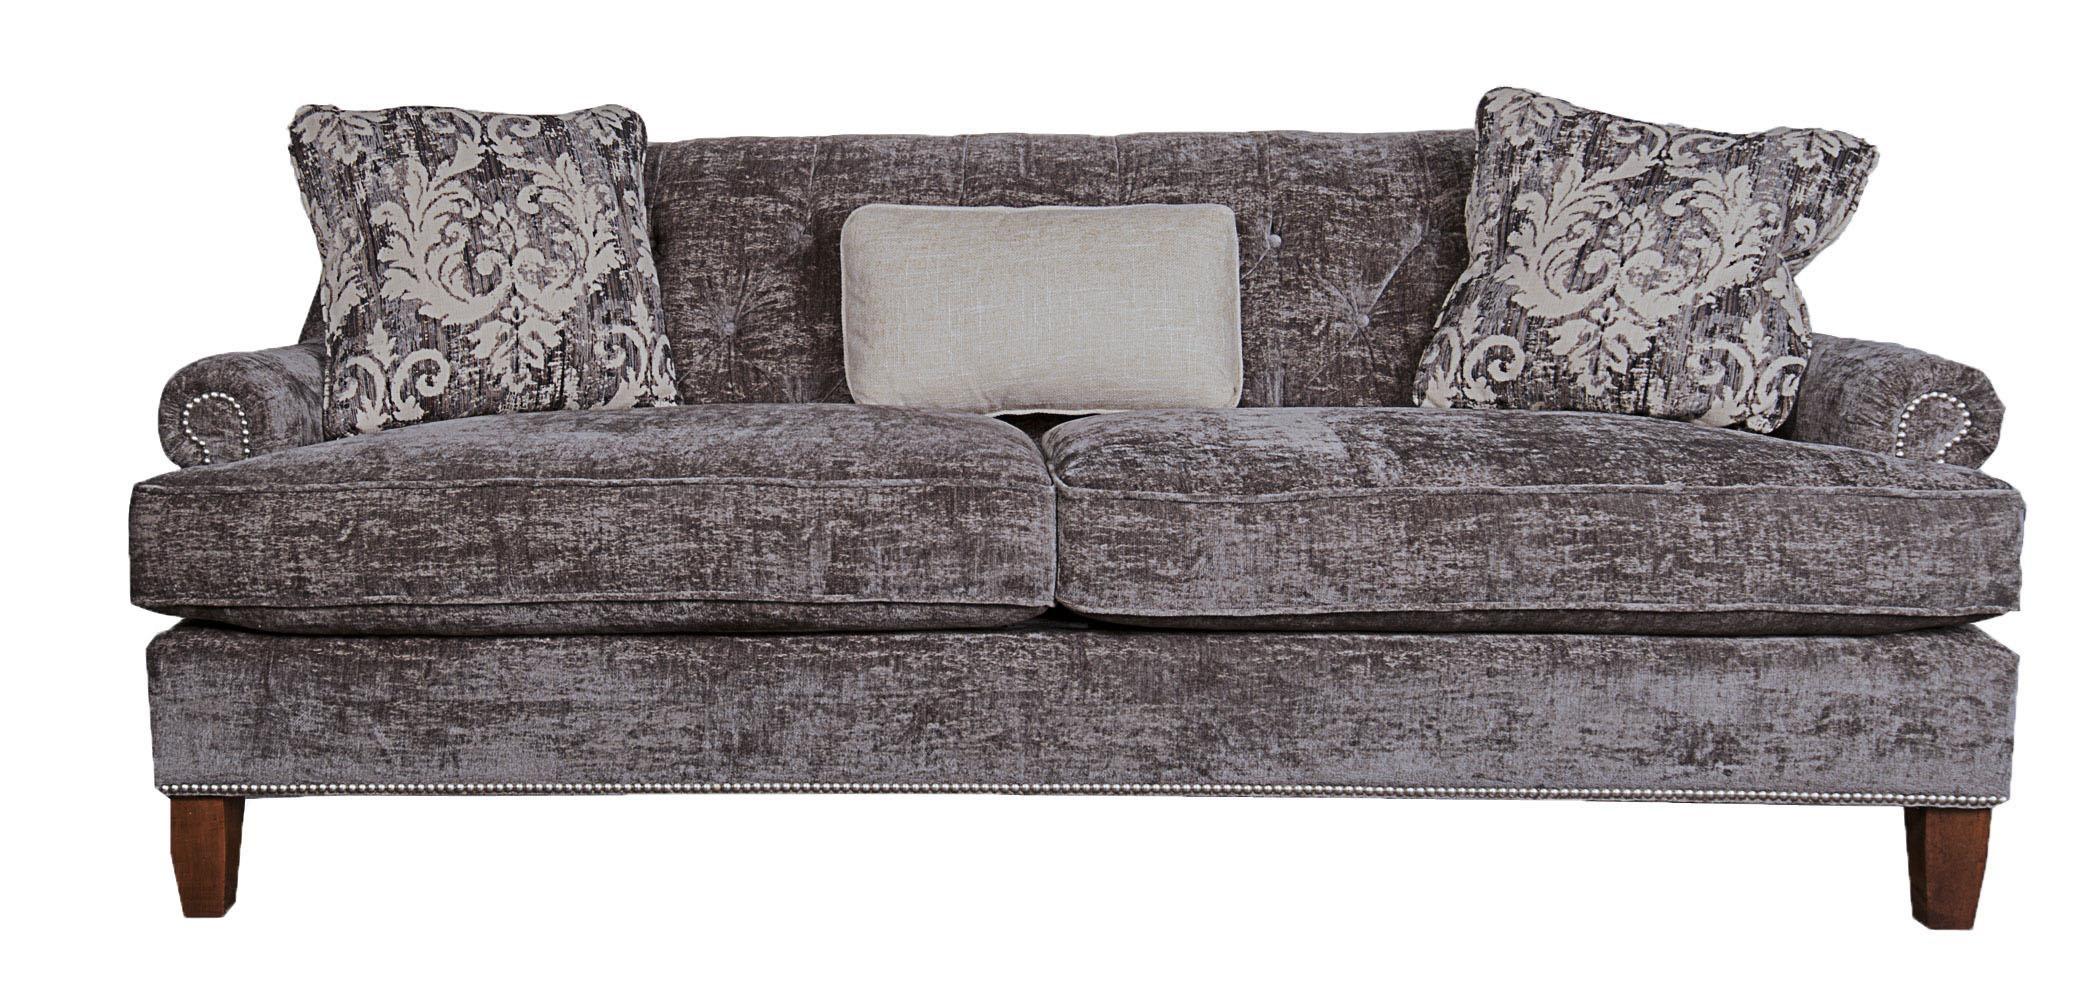 Morris Home Furnishings Upstate Upstate Sofa - Item Number: 775187899